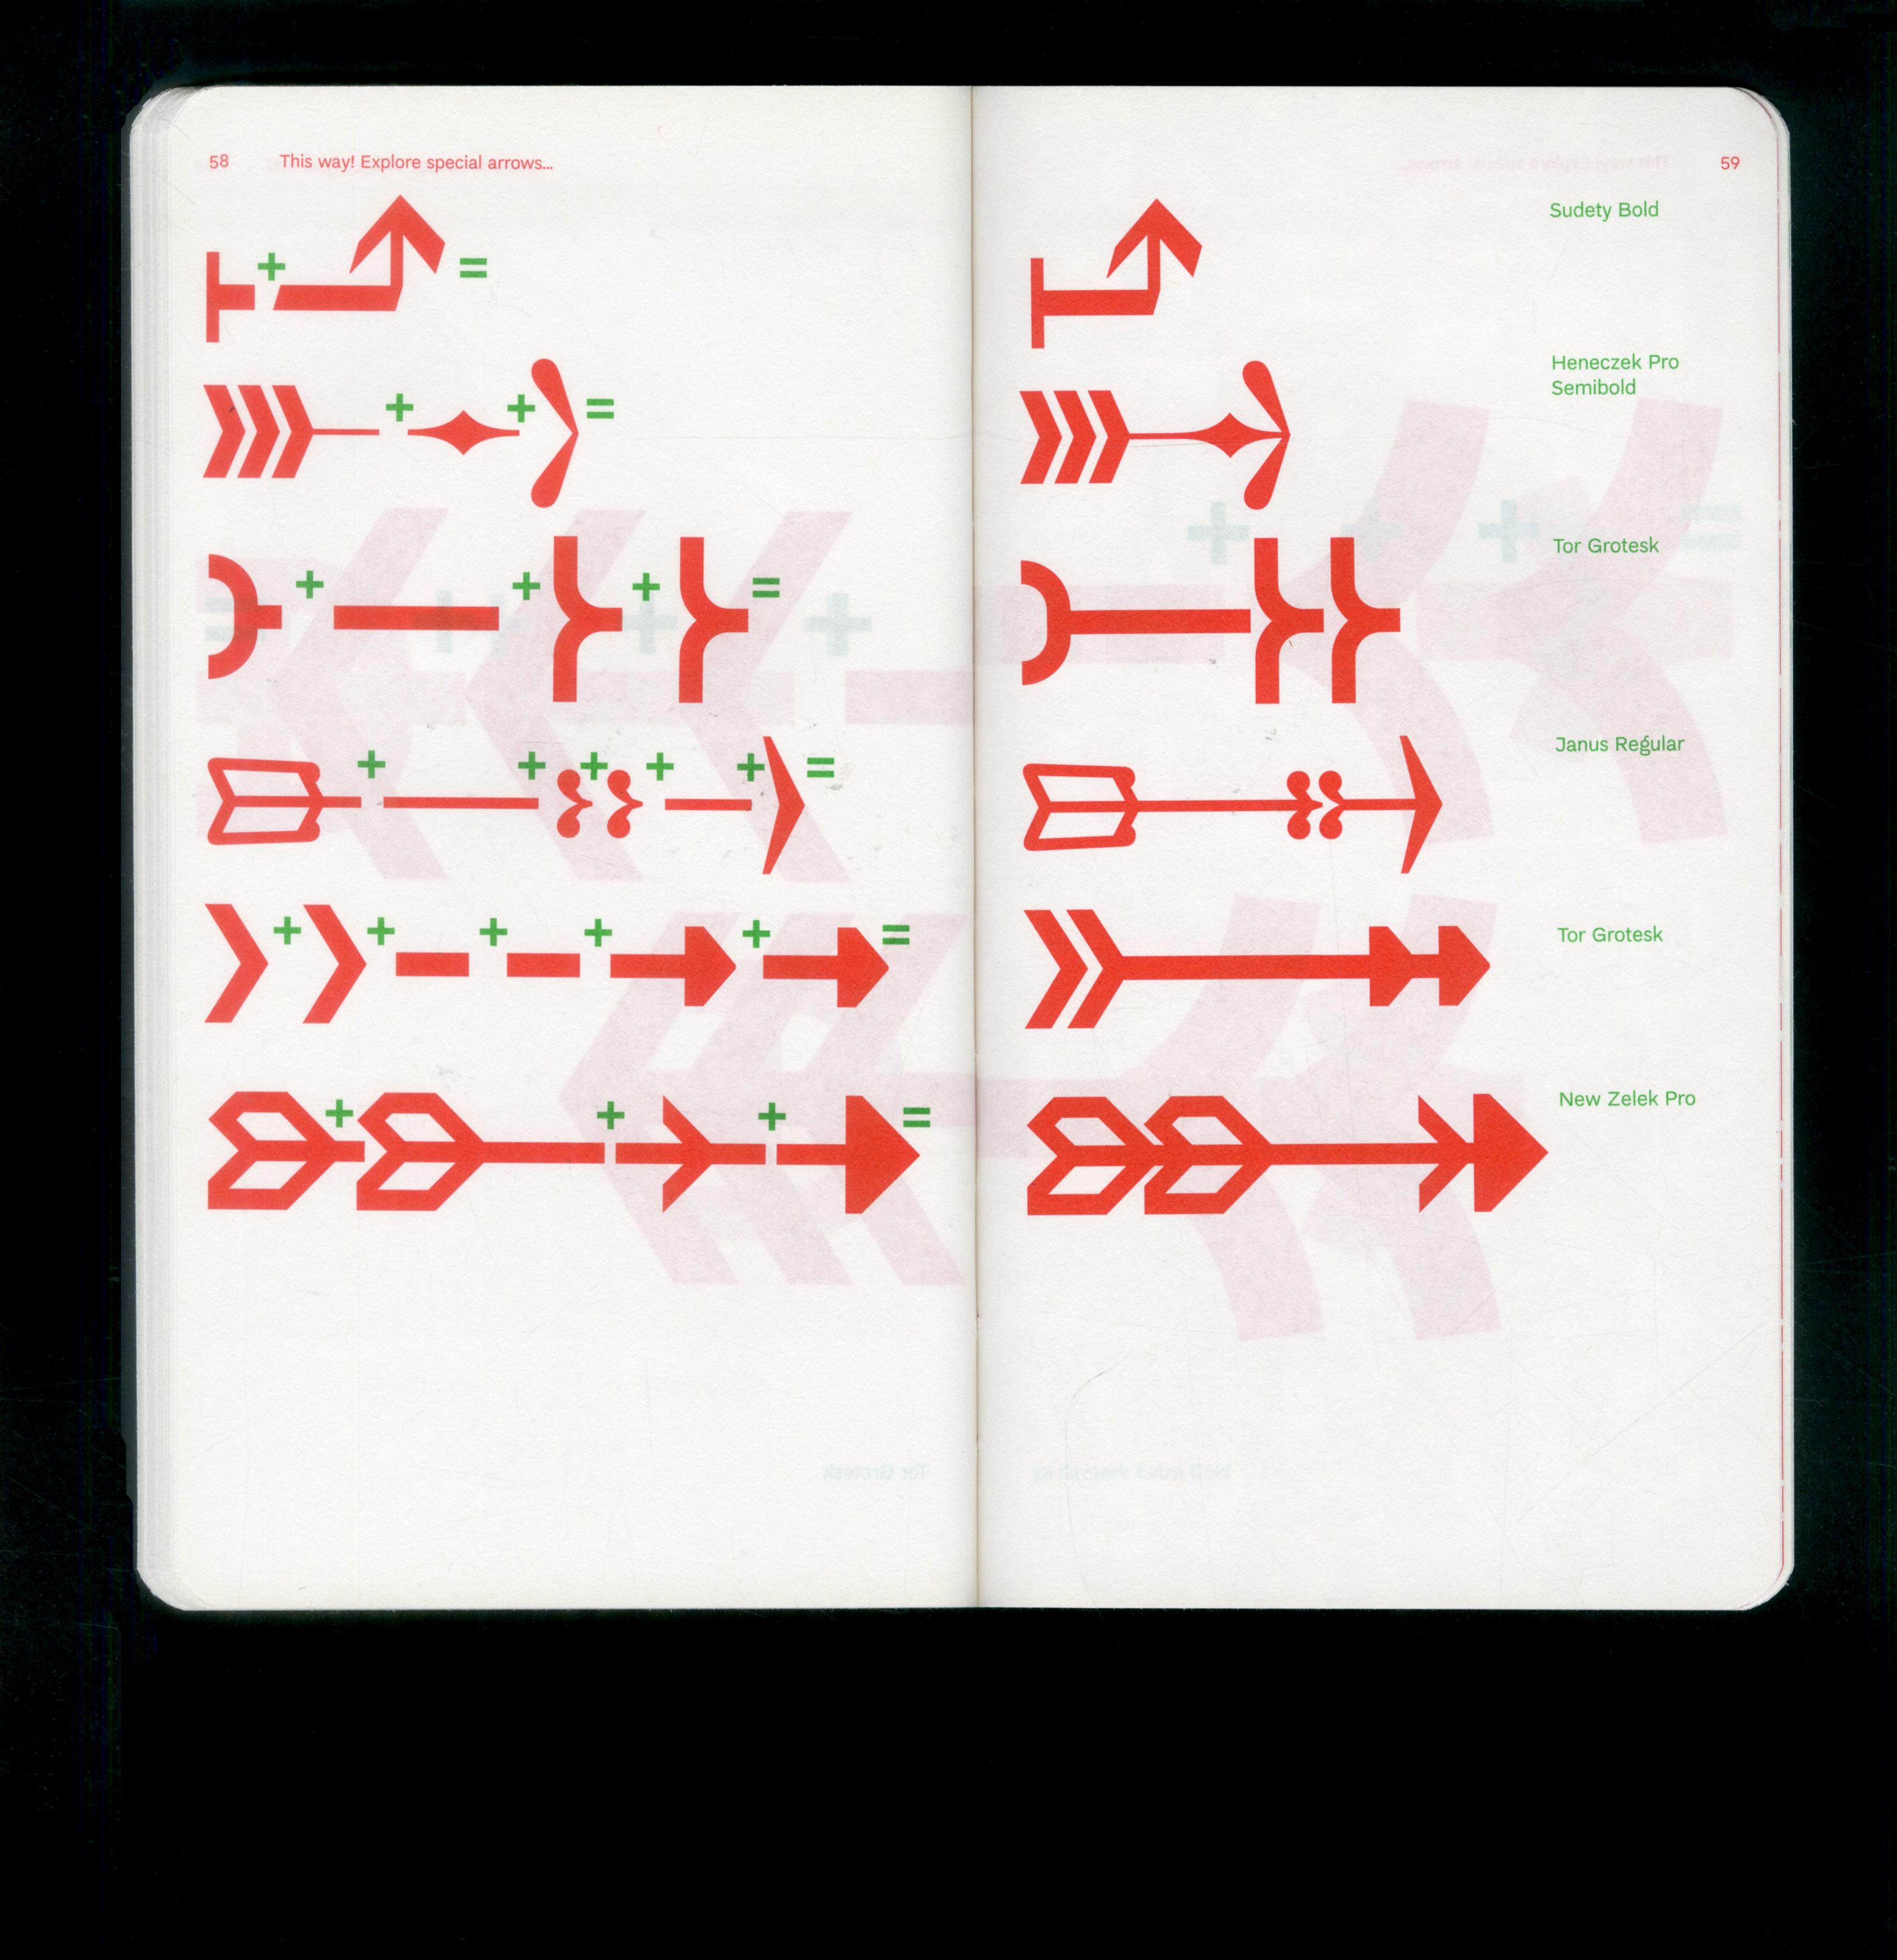 This way. Specimen 06